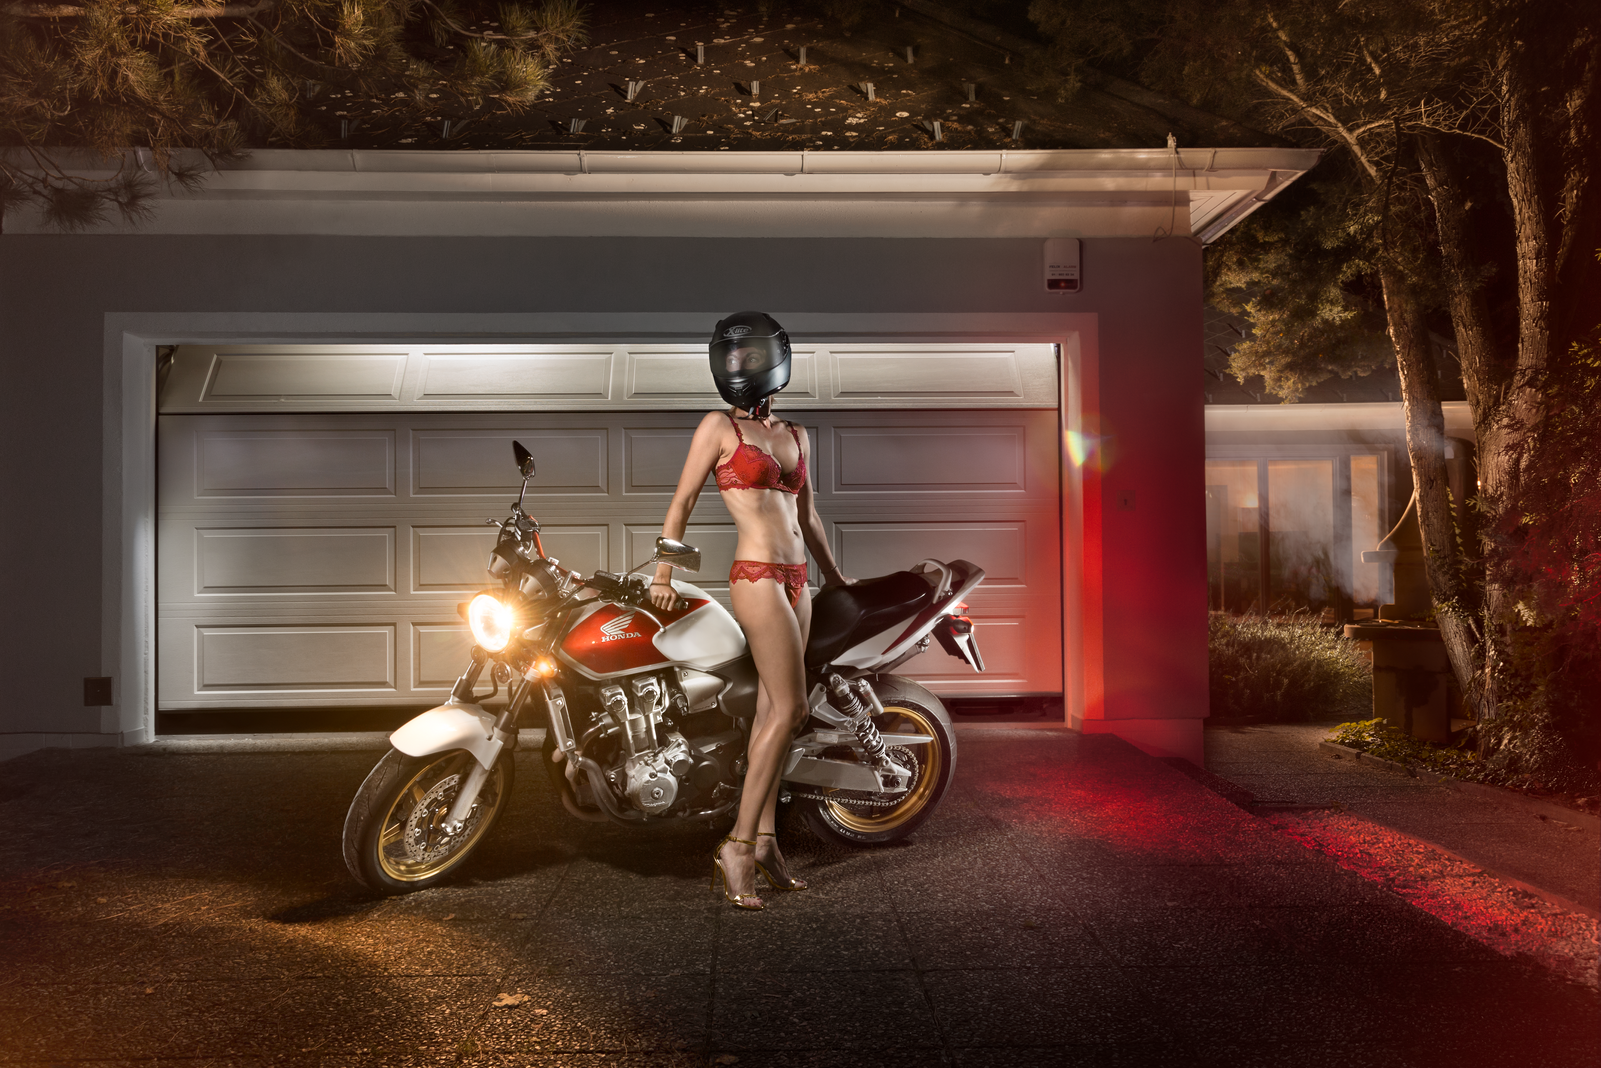 Lightpainting Honda CBR 600 vor Garage mit Girl Lightrider Fotografie Christian Novak NOVY Multimedia Productions